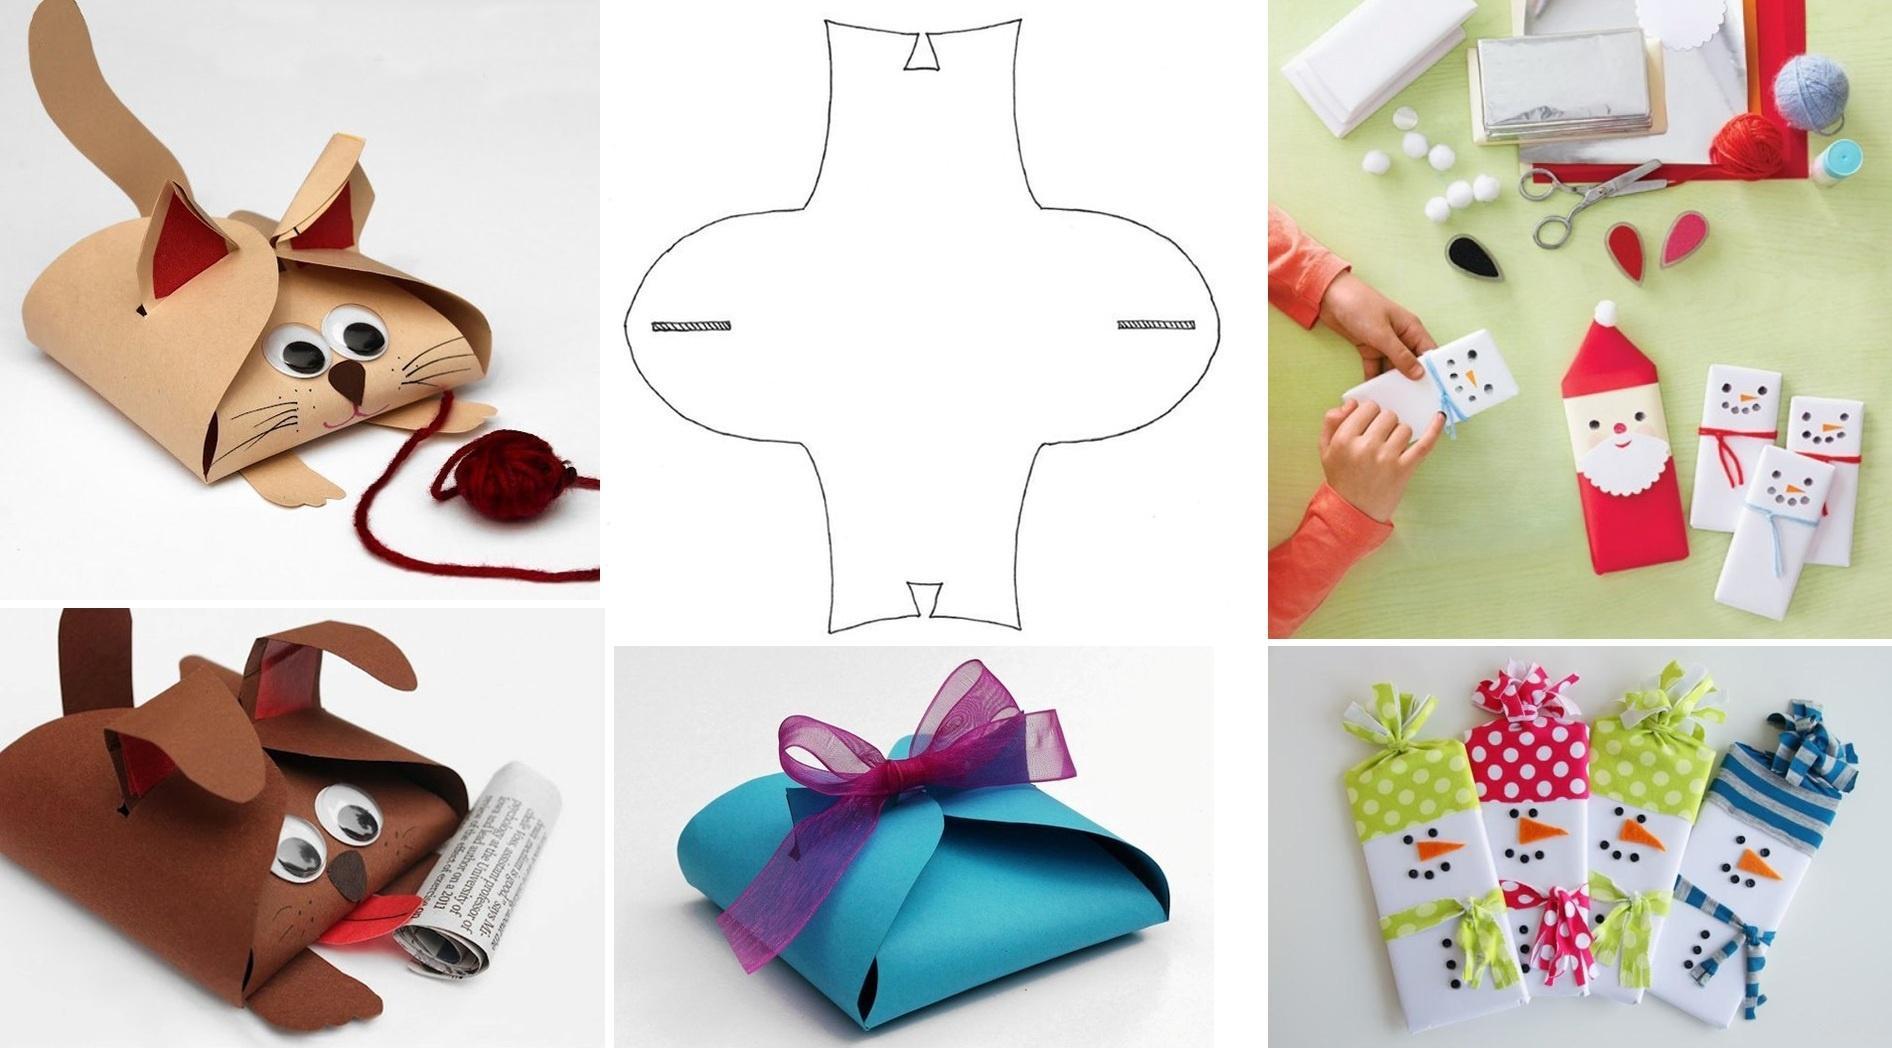 30 крутых подарков друзьям на новый год - лайфхакер